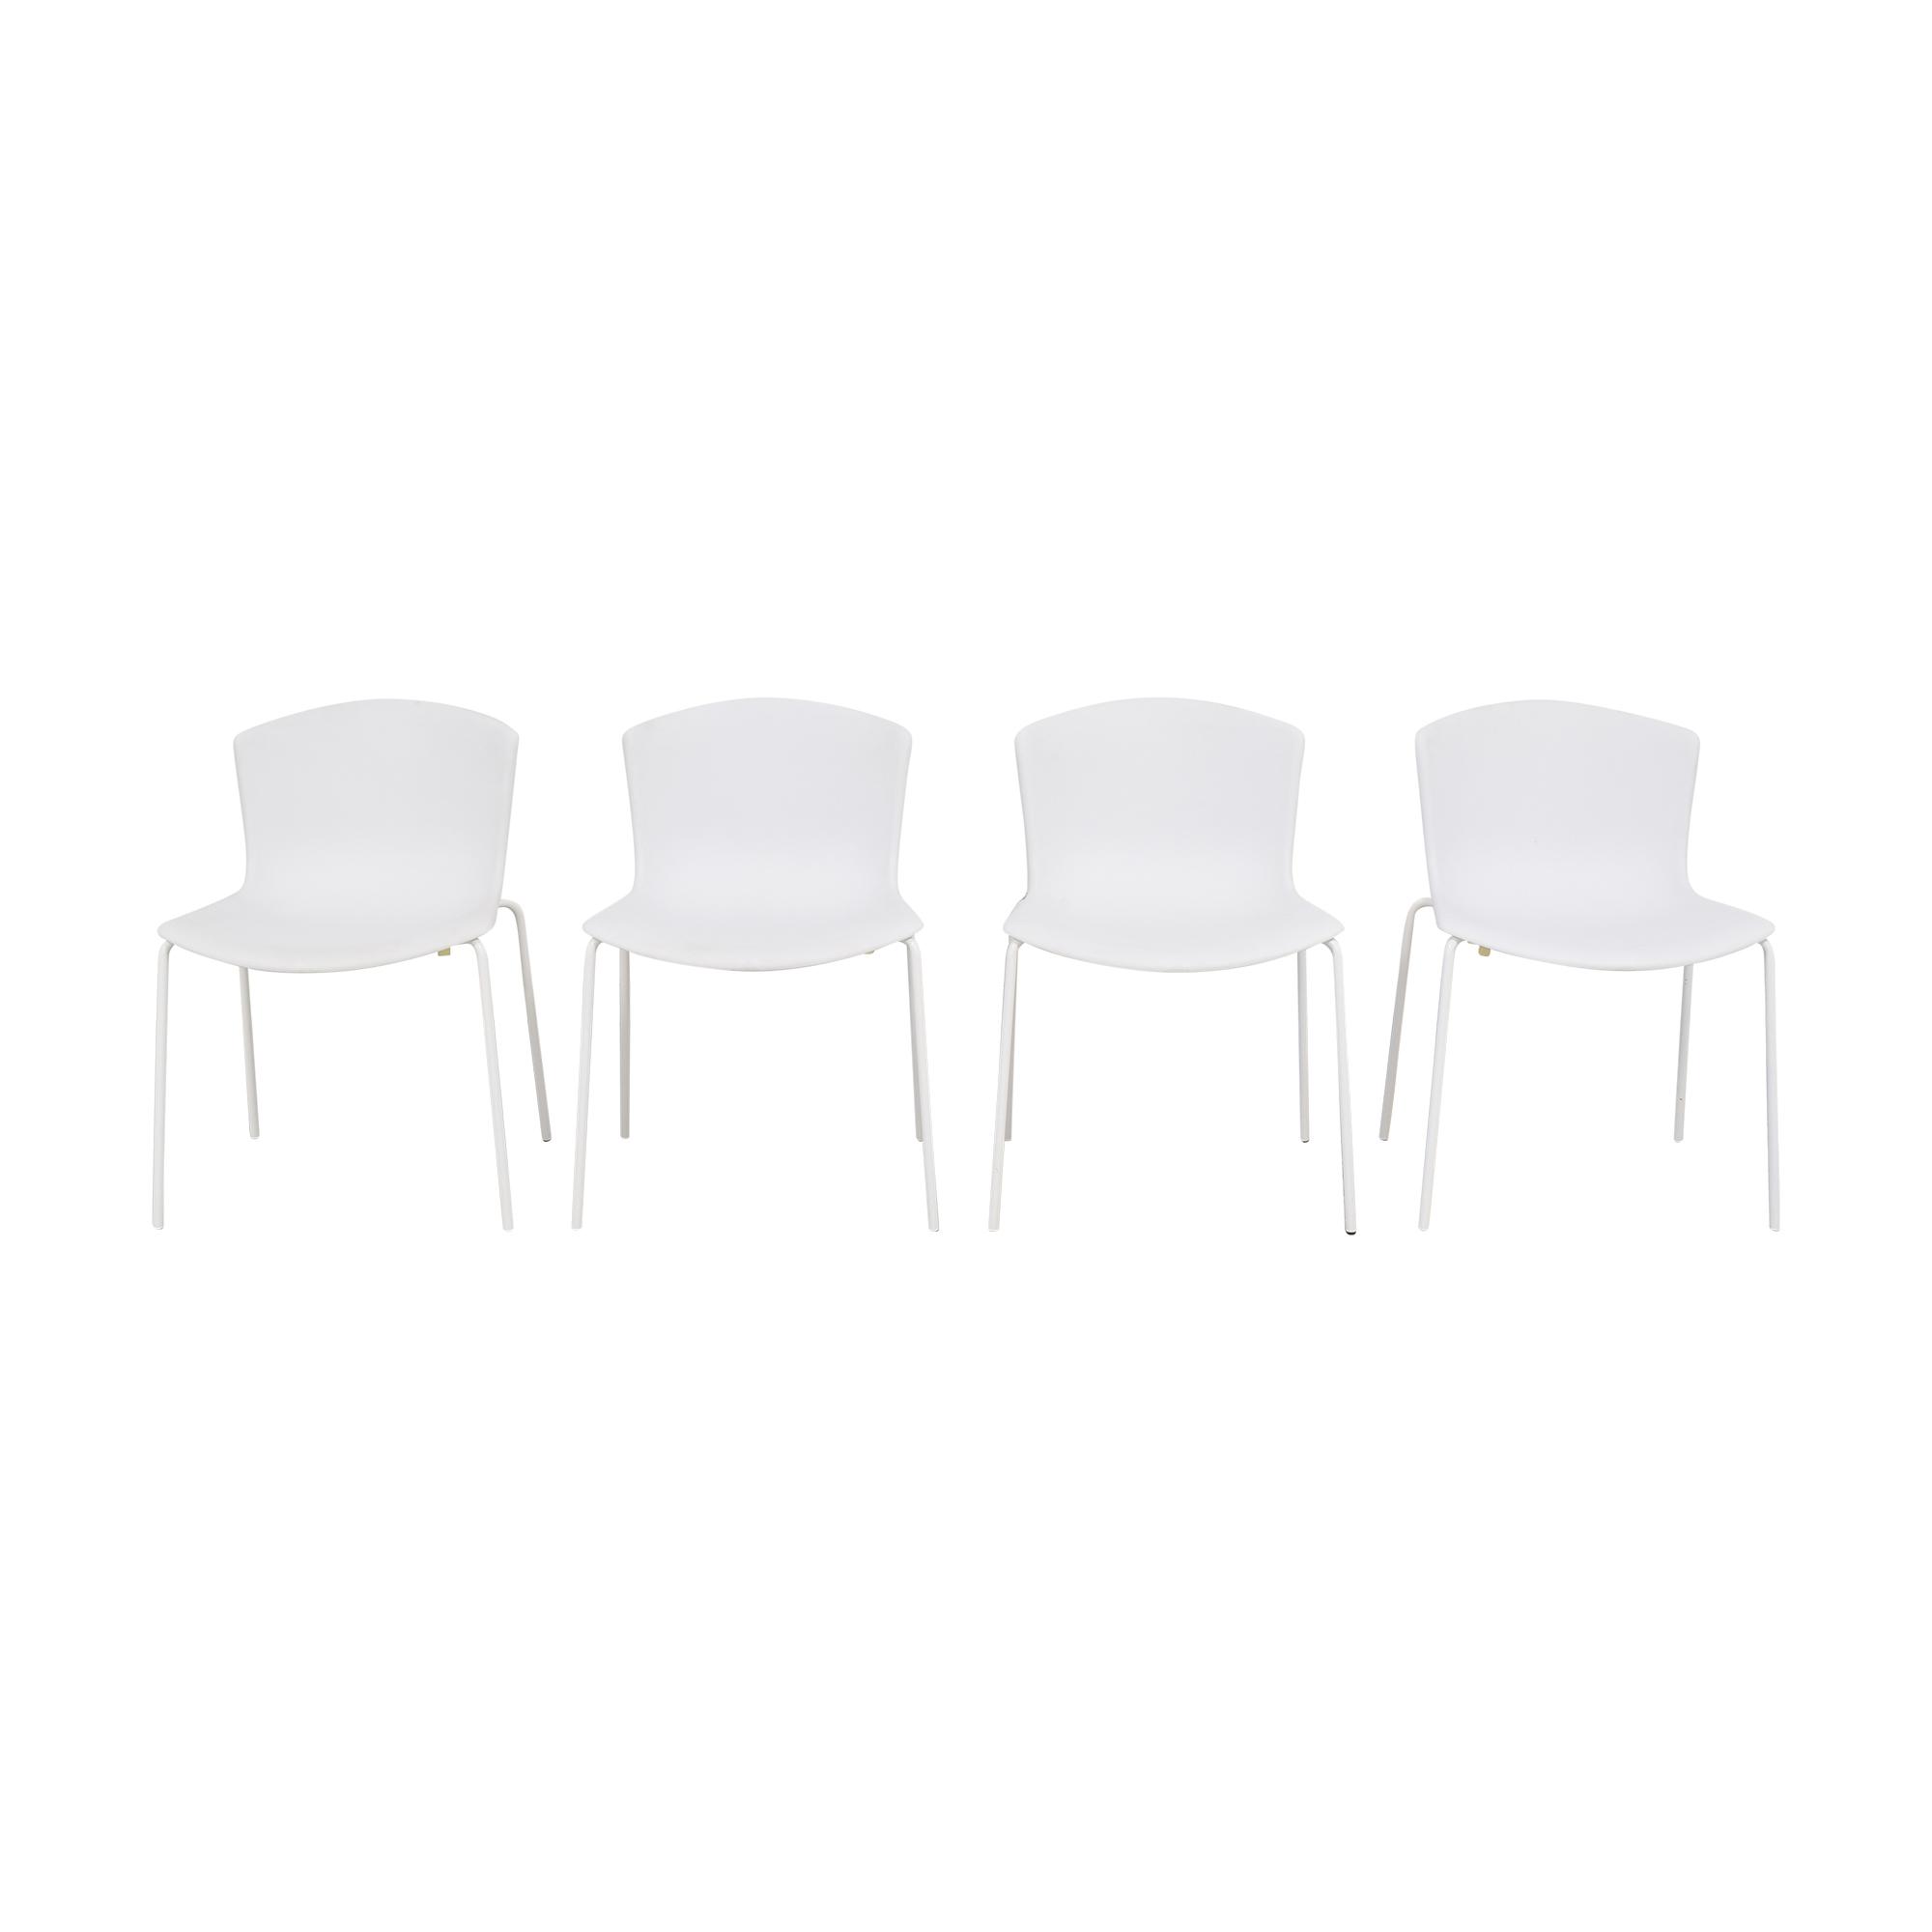 buy Knoll Bertoia Molded Shell Side Chair Knoll